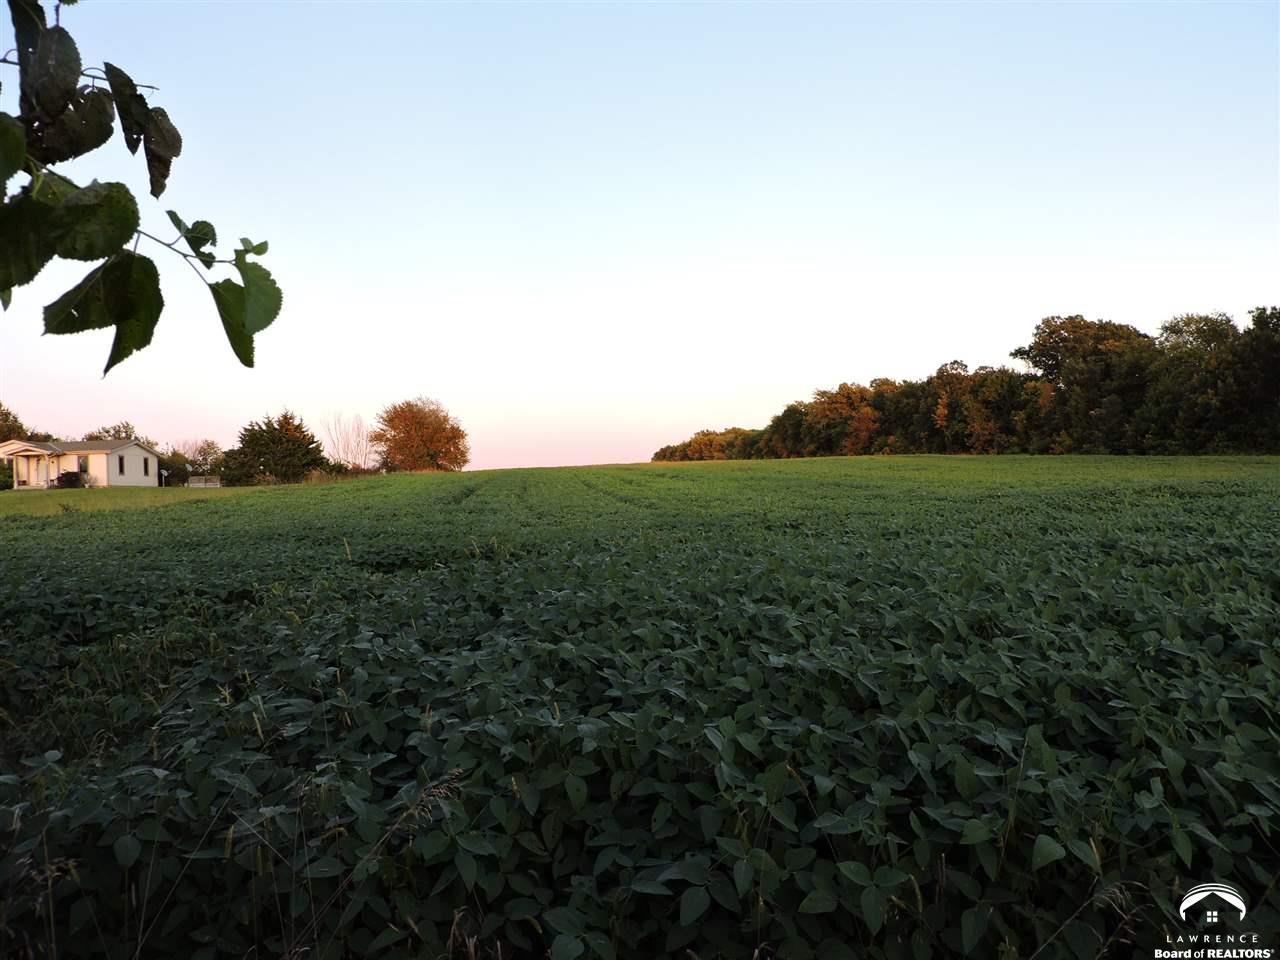 Photo of 38.46 Acres 2200 Road Eudora KS 66025